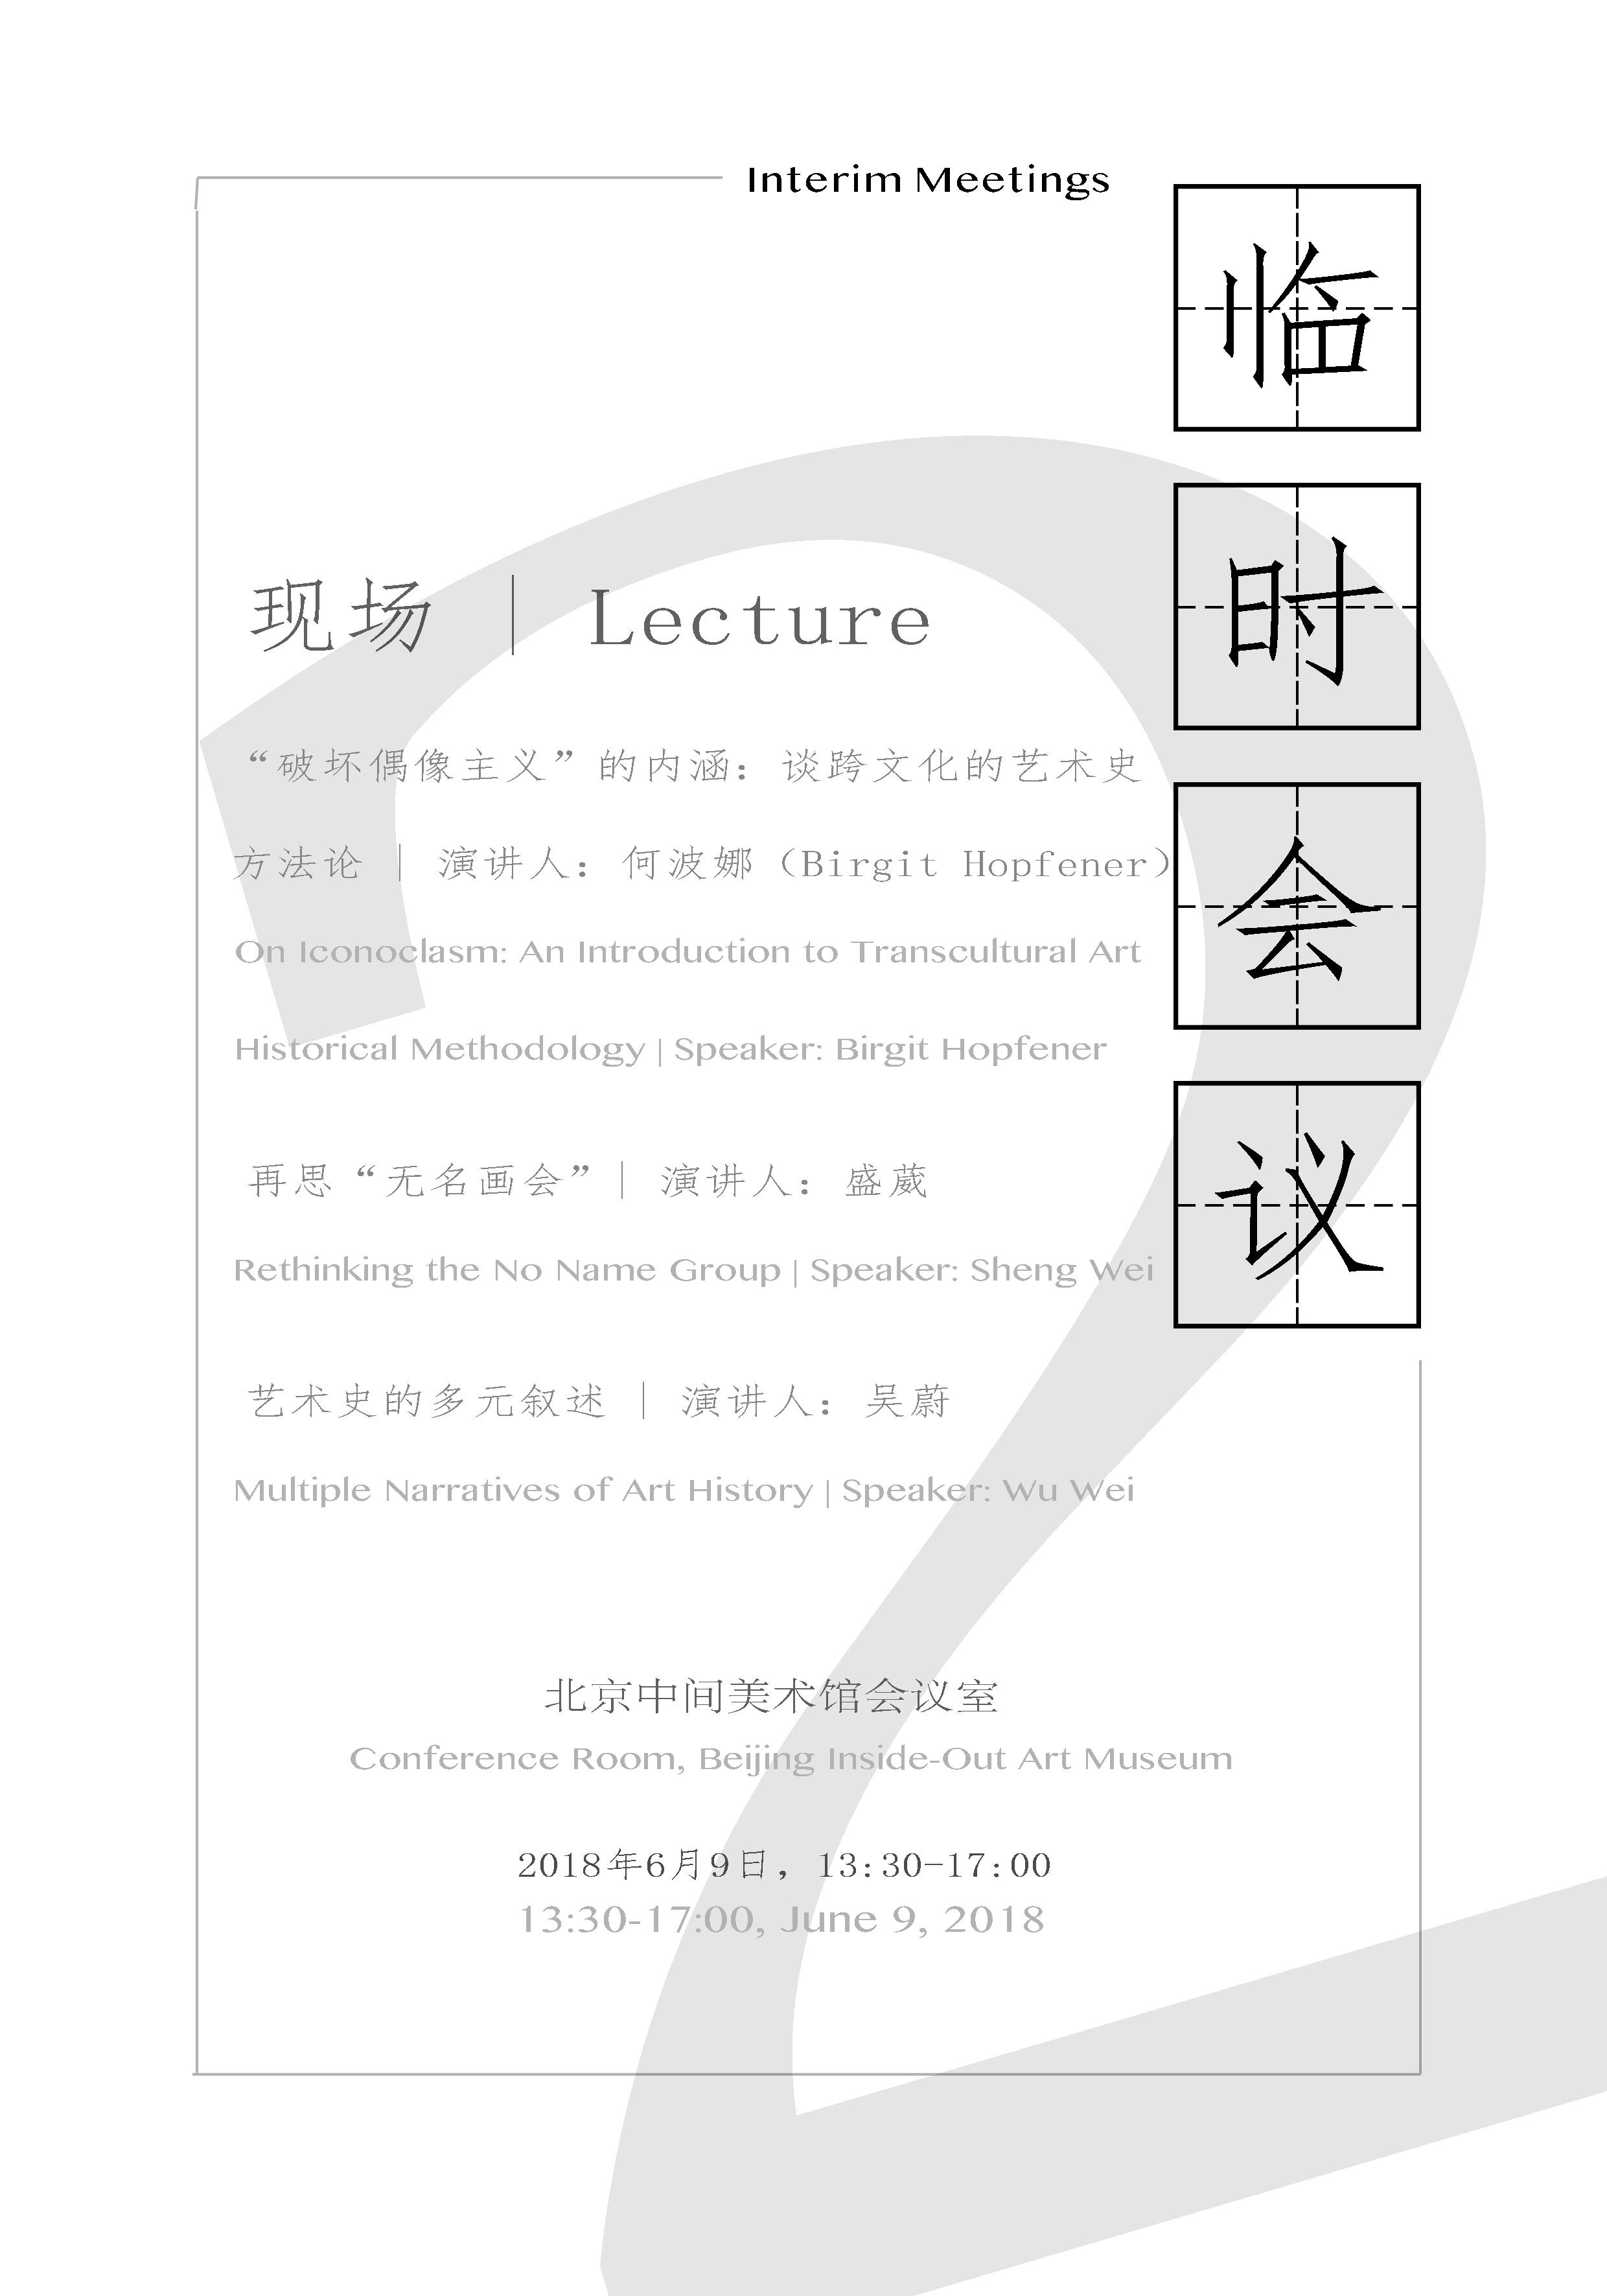 Poster of Birgit Hopfener's public talk at the Inside-Out Art Museum